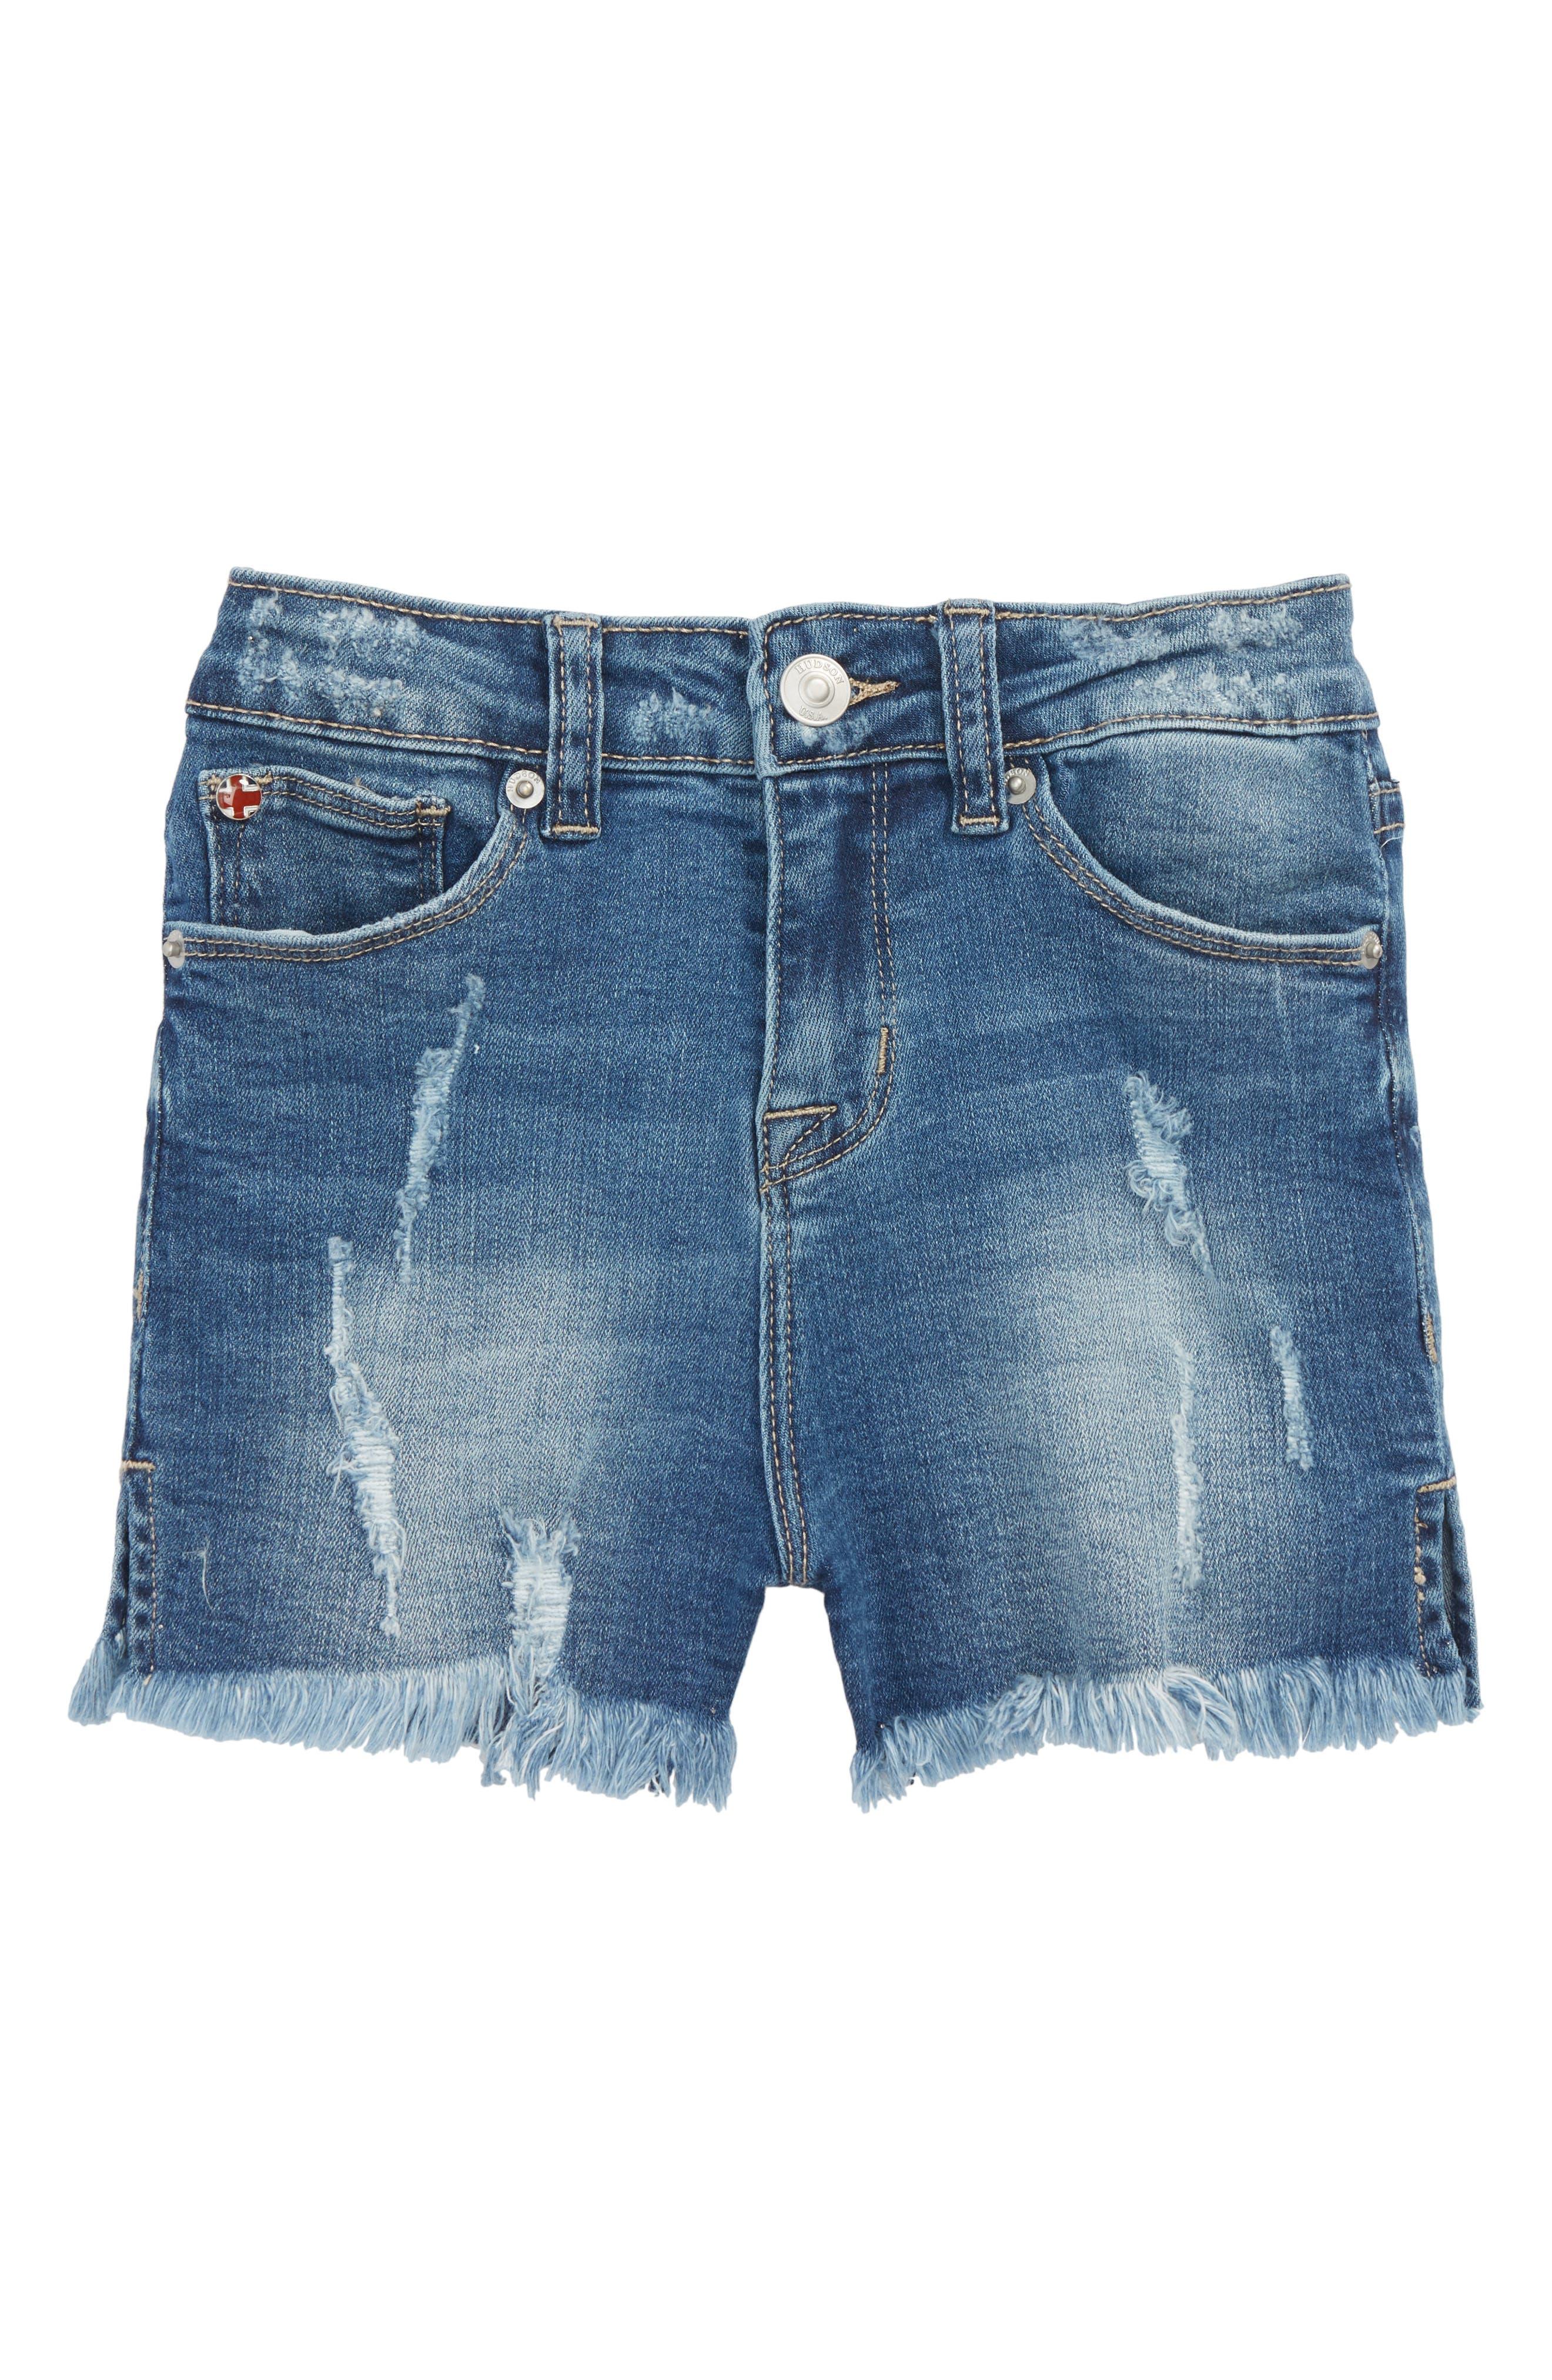 Lily High Waist Cutoff Denim Shorts,                             Main thumbnail 1, color,                             499